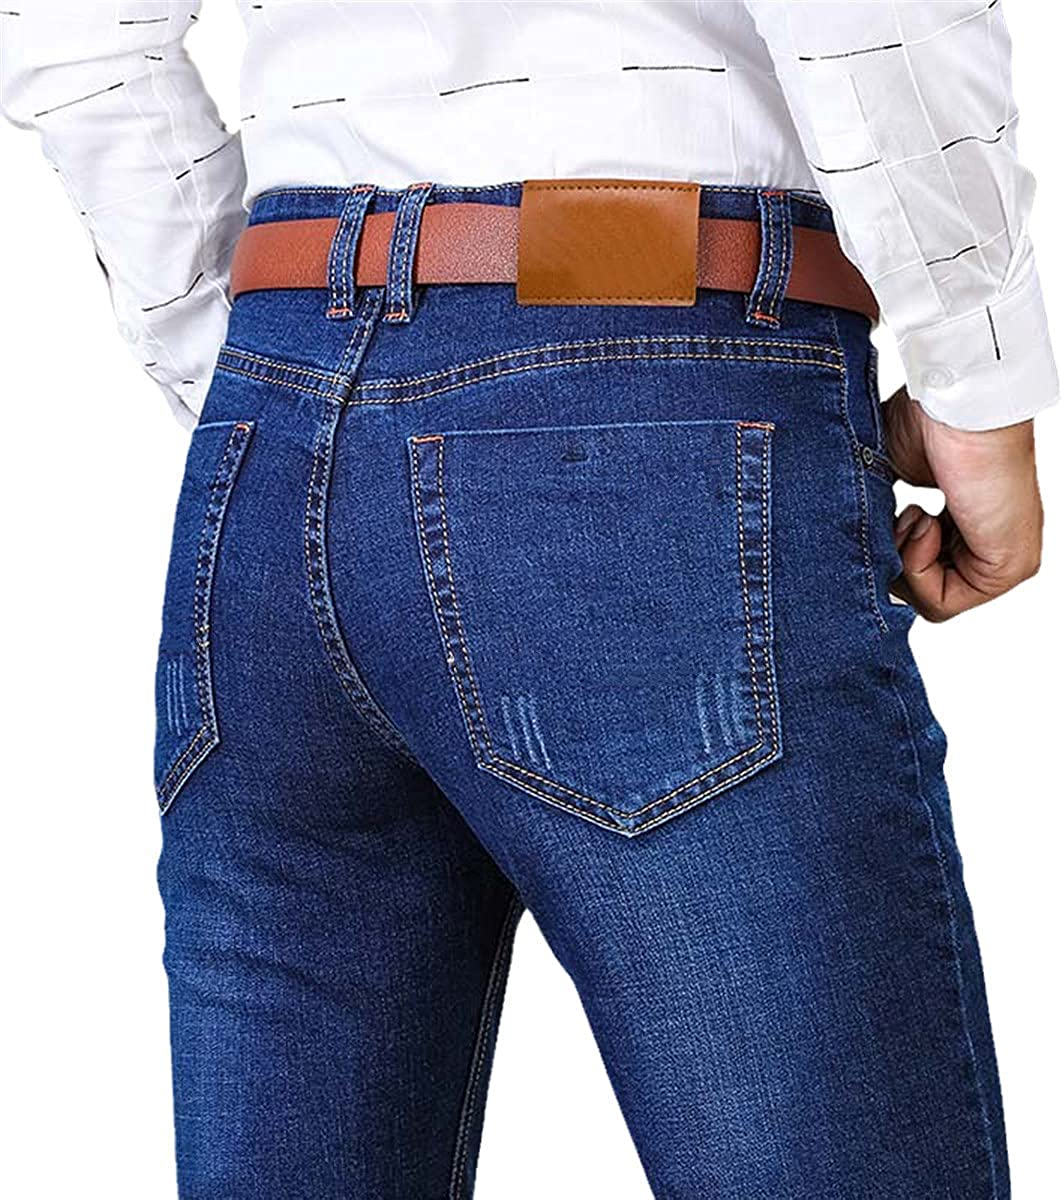 Men's Classic Jeans Overalls Fashion Trend Pants